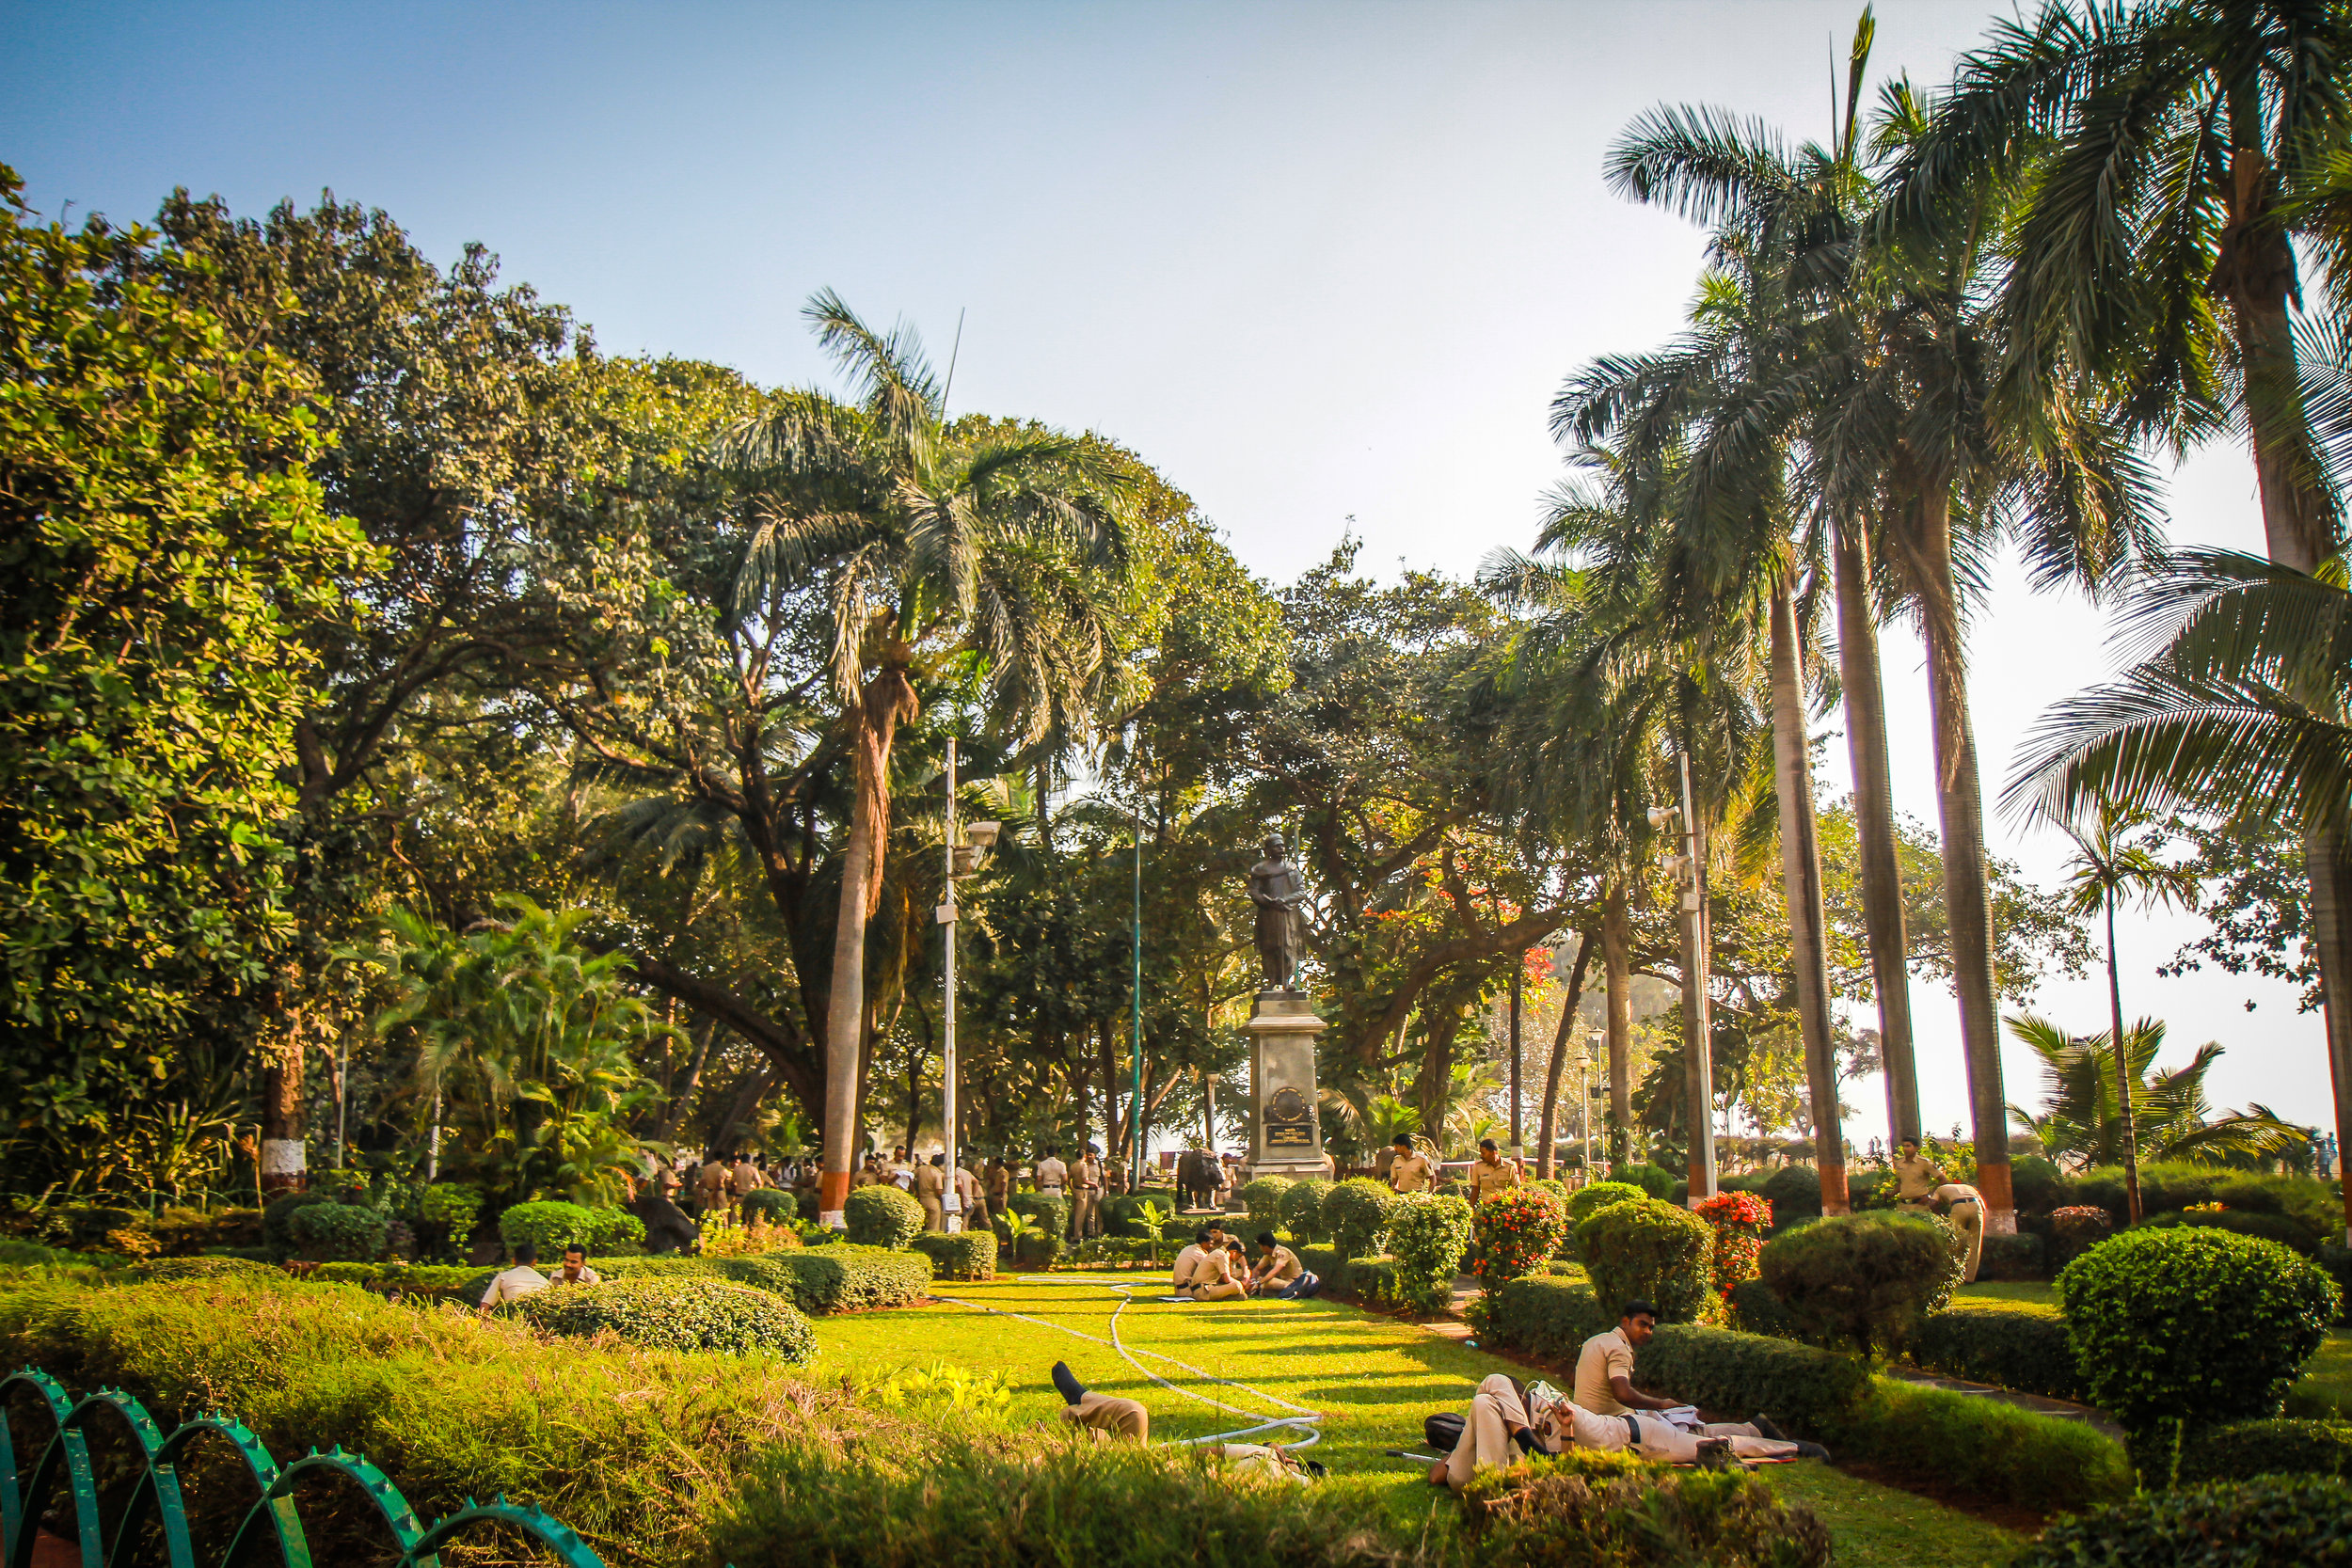 """ Beach Garden"" Chowpatty, Girgaon, Mumbai,India"